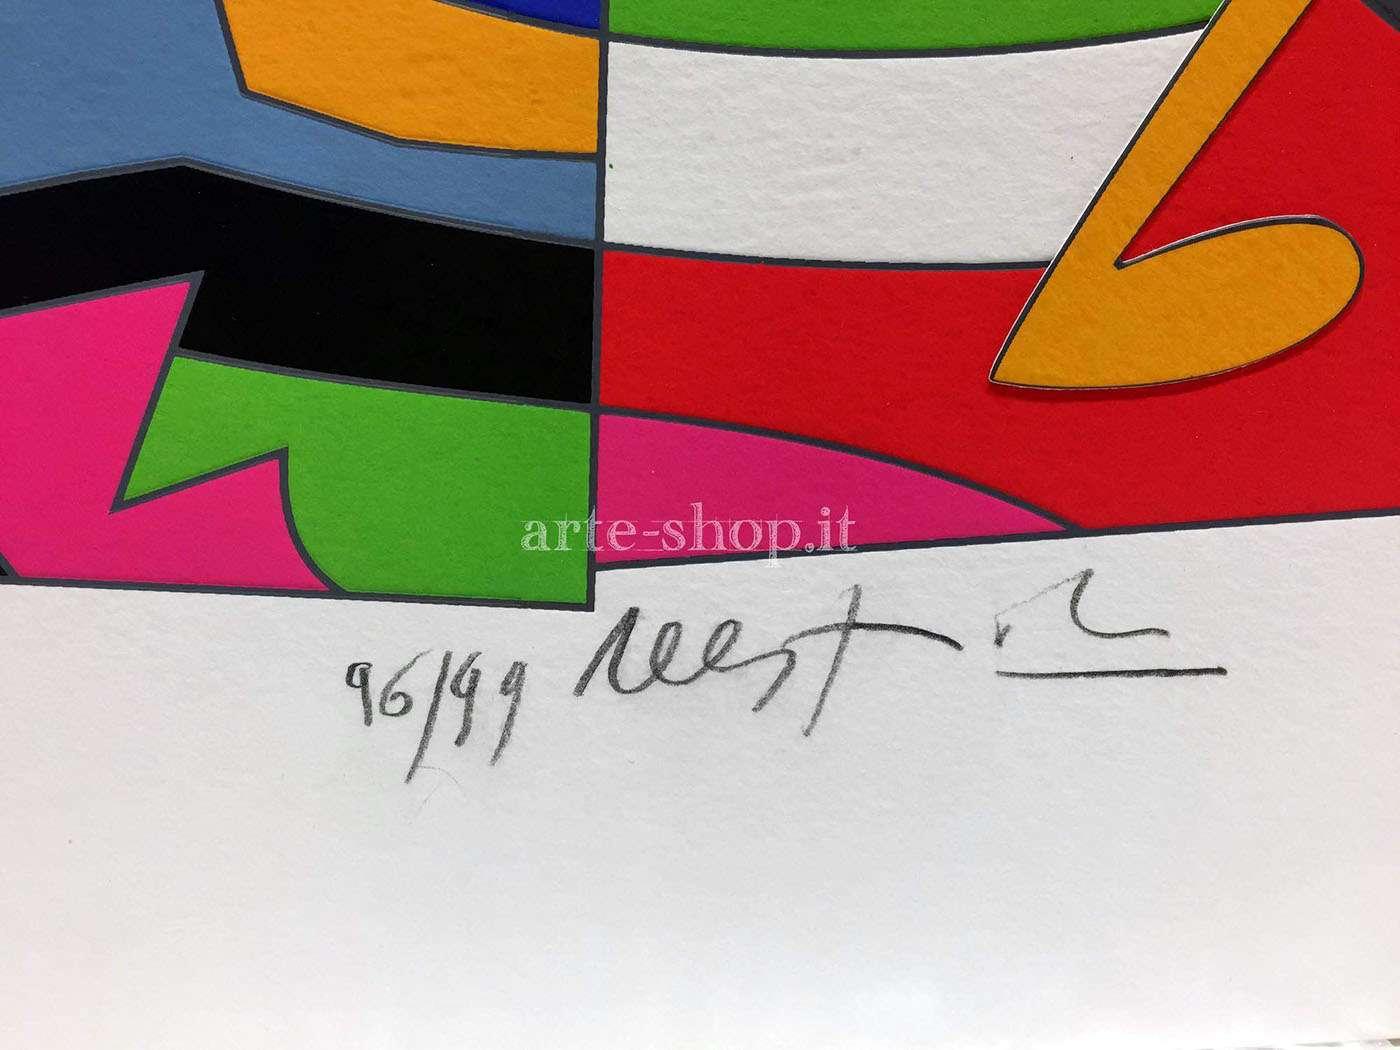 arte pentagono shop dettaglio numero 393